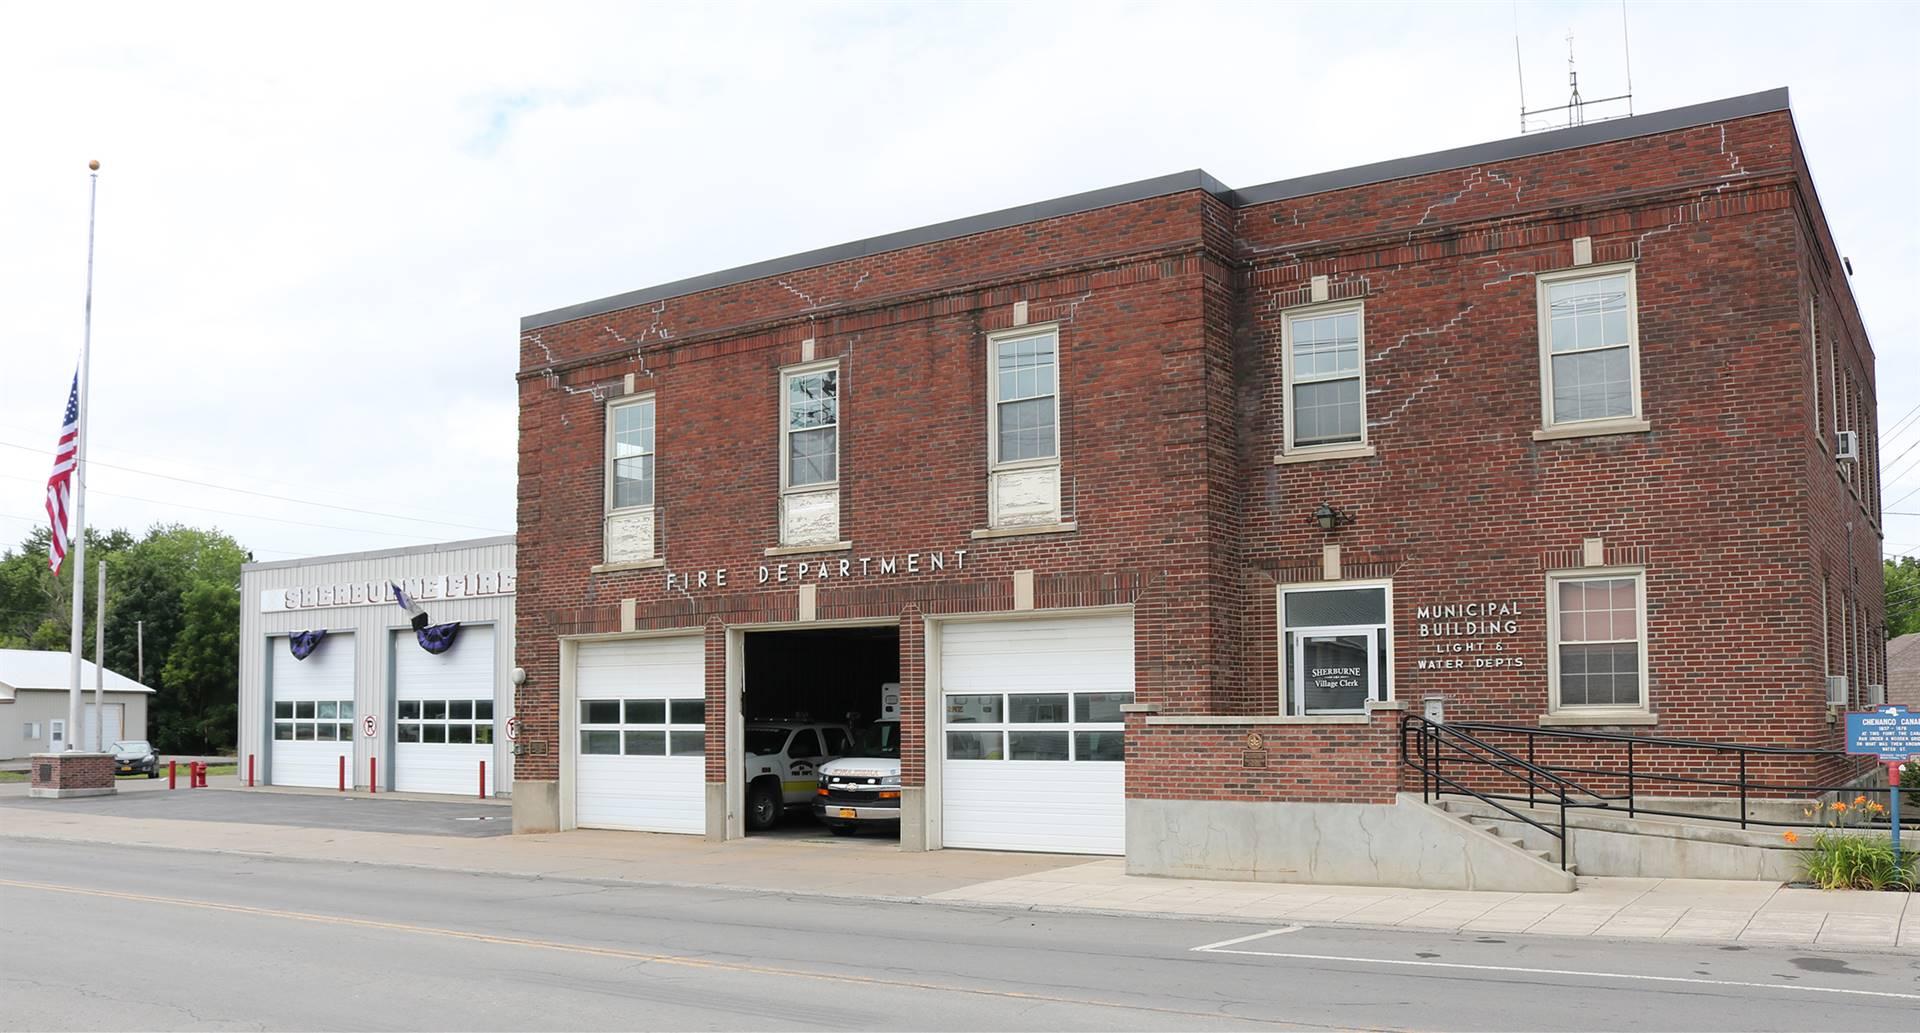 Sherburne Fire Department